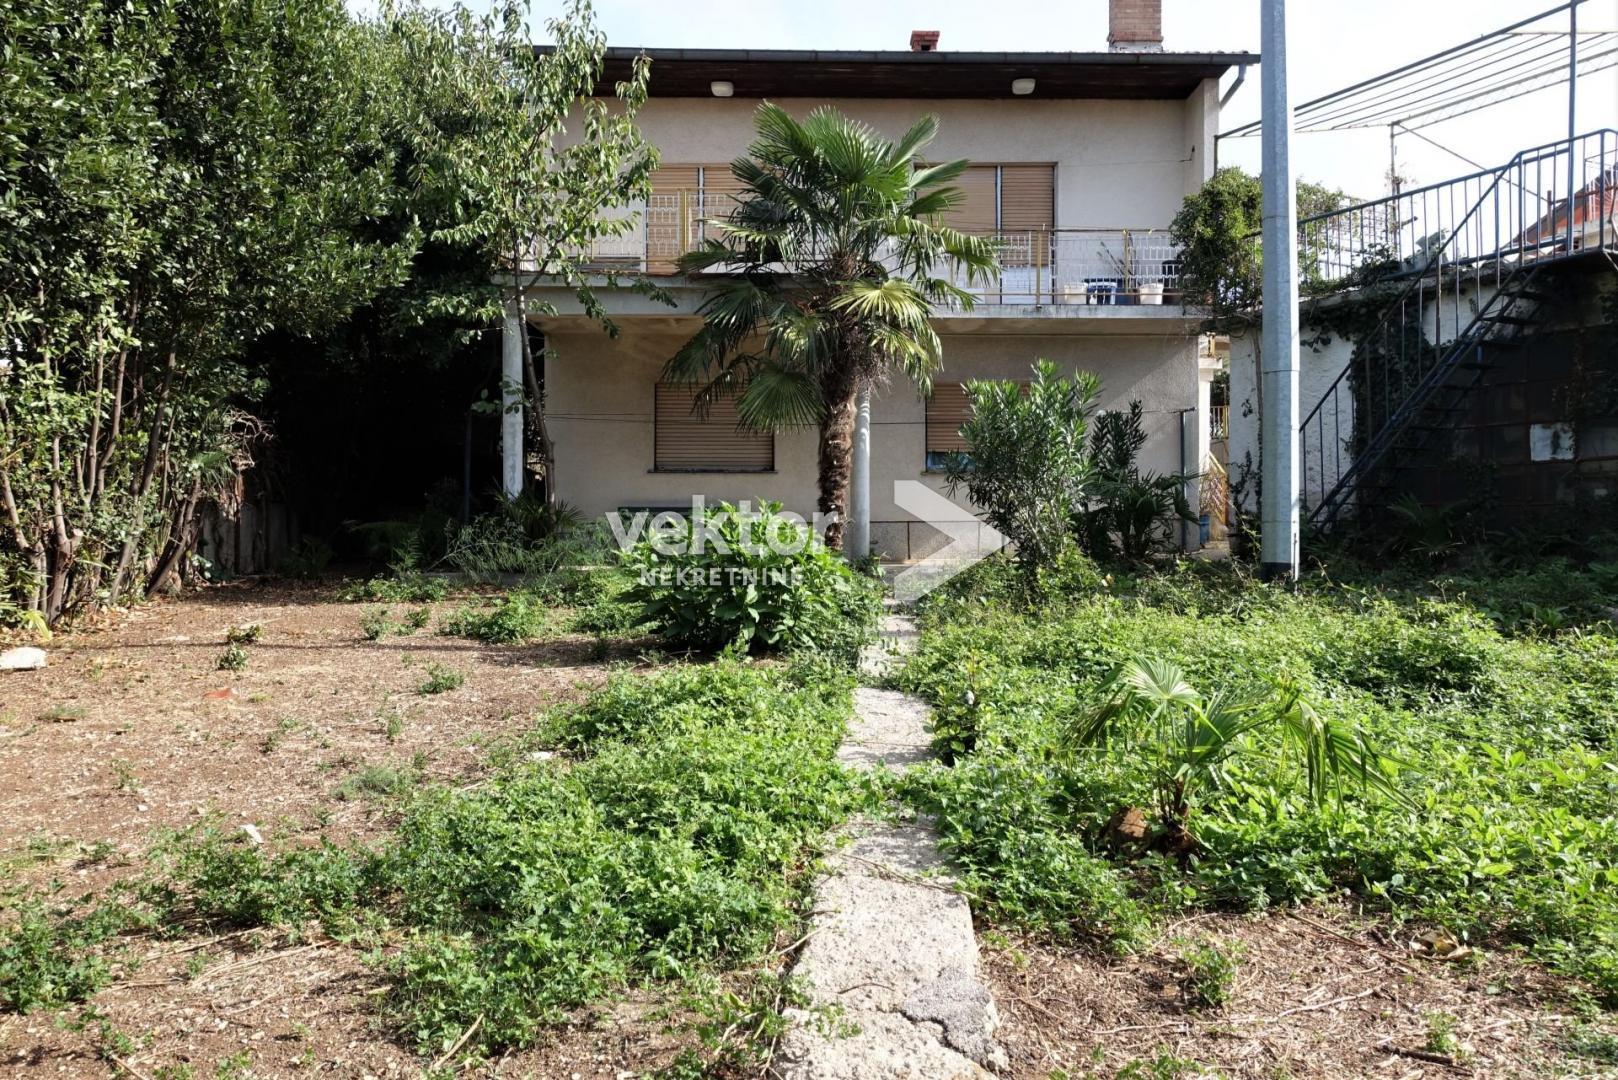 Kuća, Trsat, 147m2, dva stana